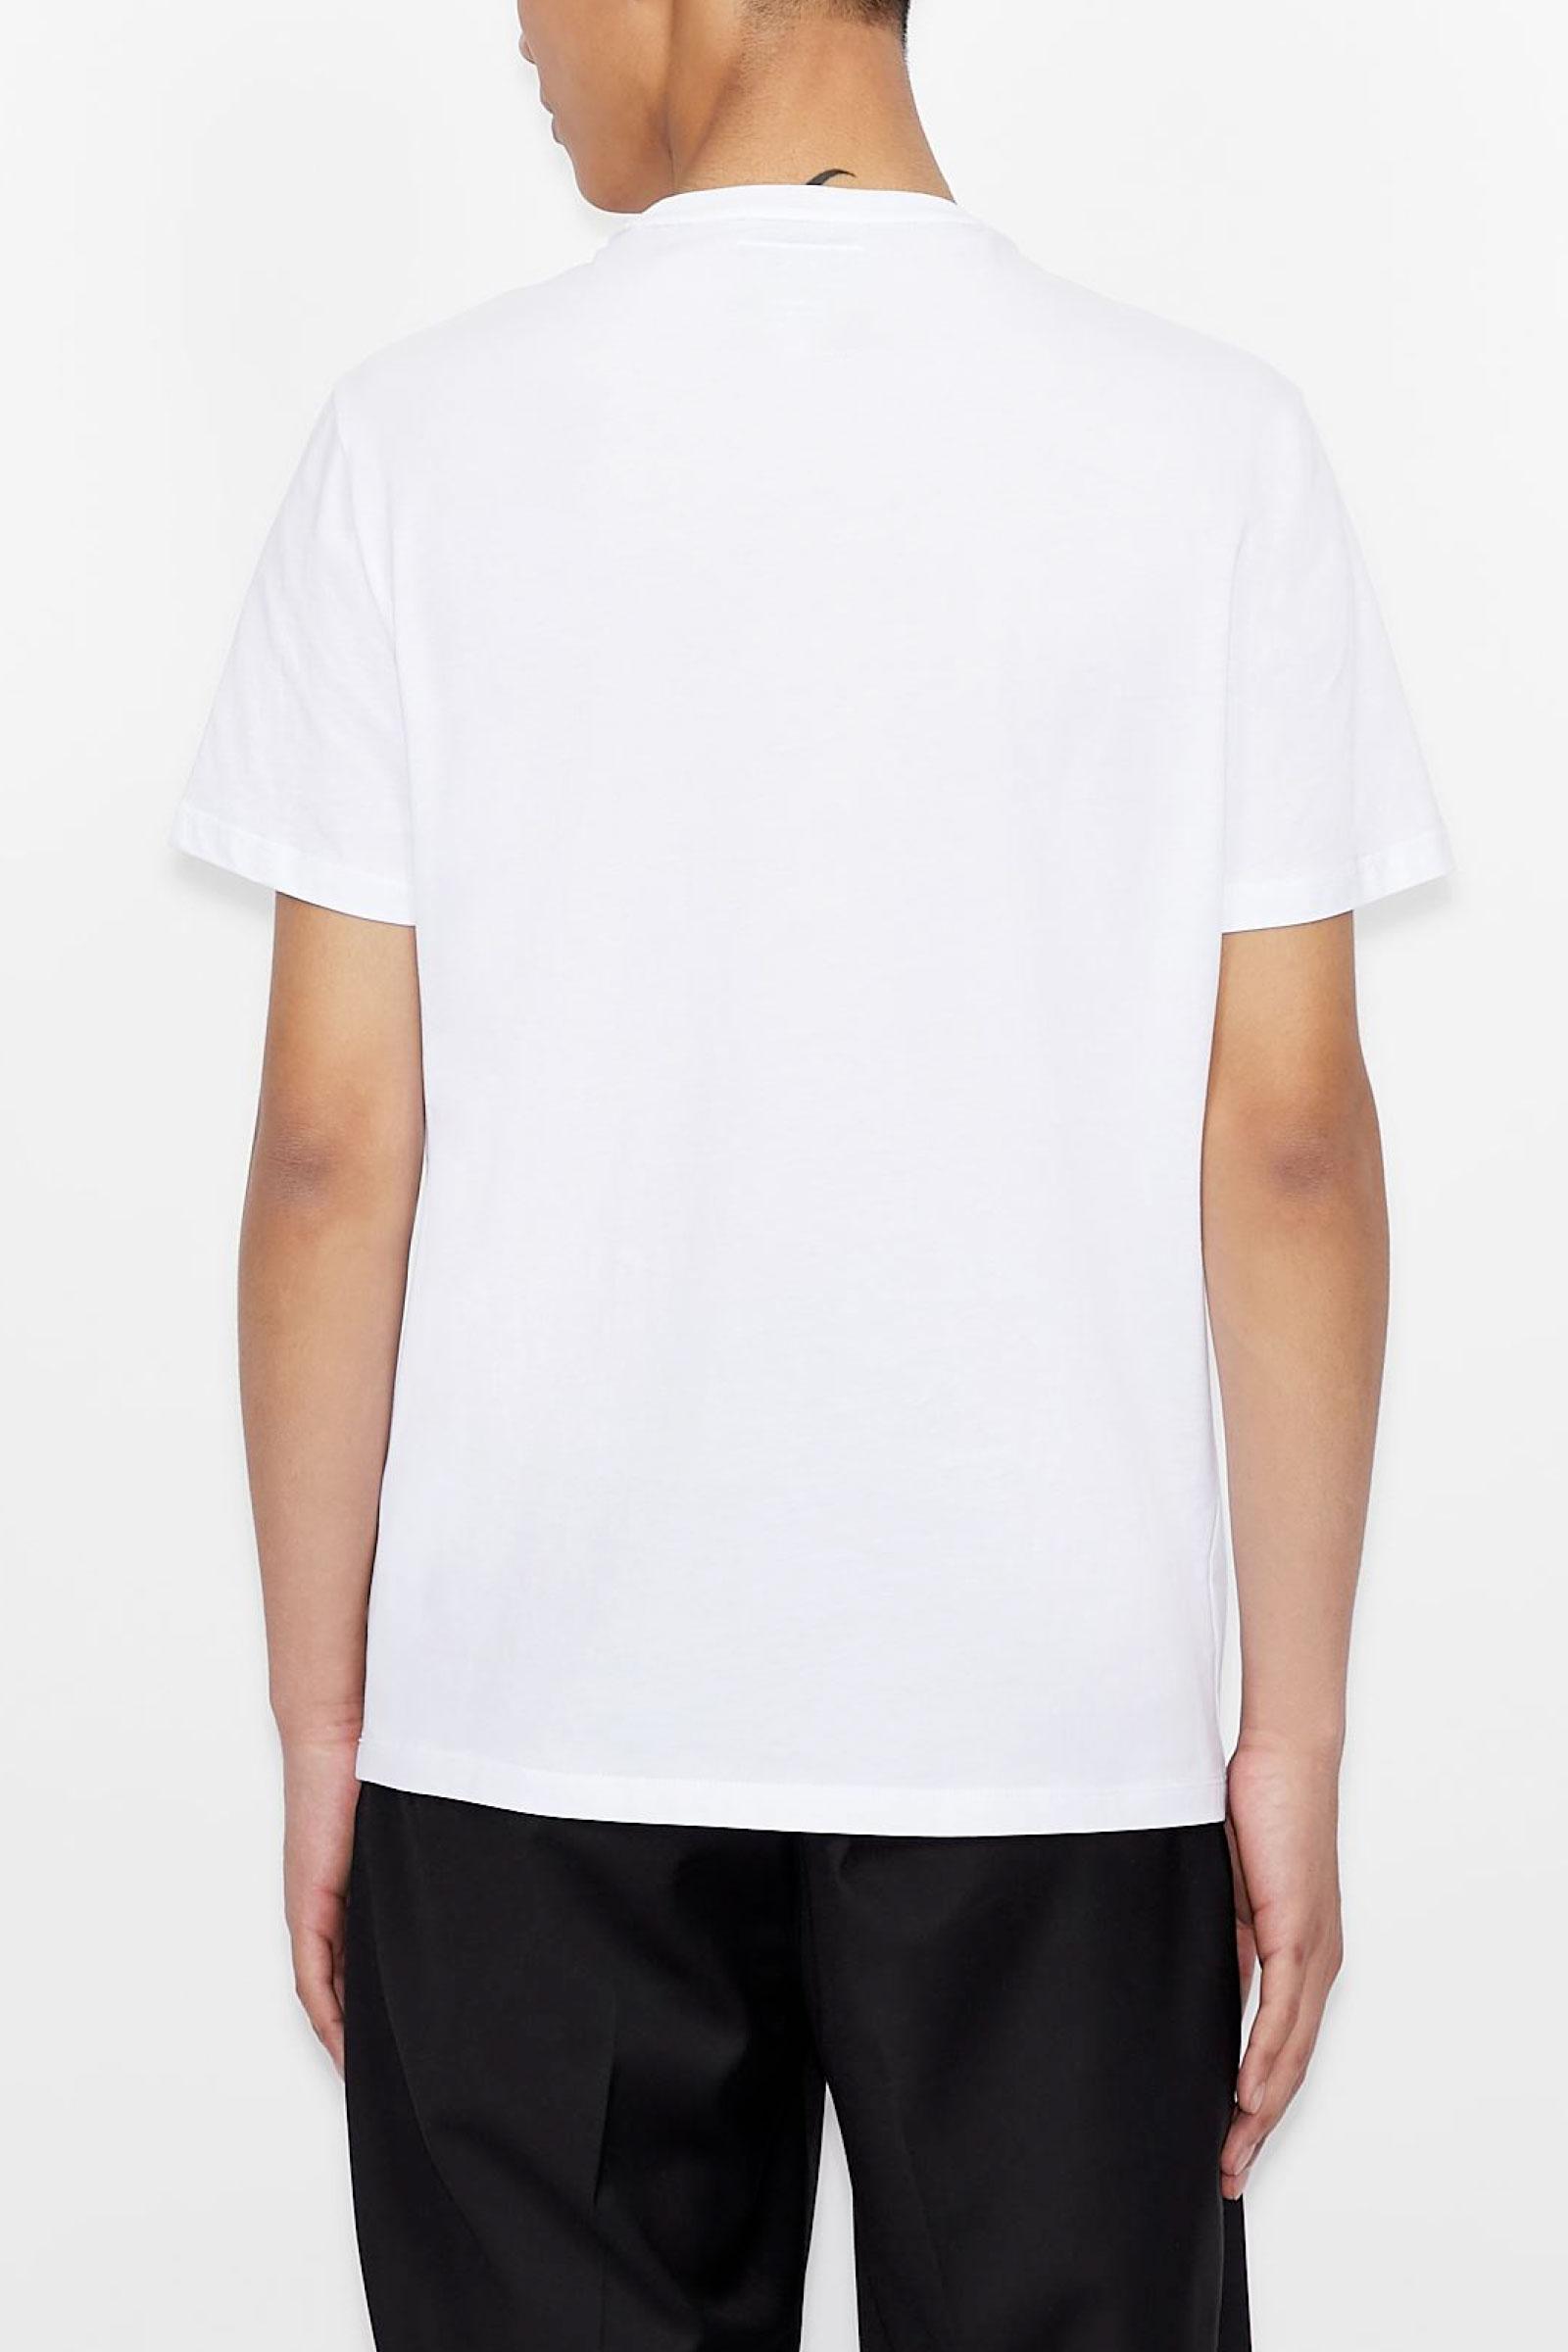 ARMANI EXCHANGE T-Shirt Uomo ARMANI EXCHANGE | T-Shirt | 8NZTPH ZJH4Z1100